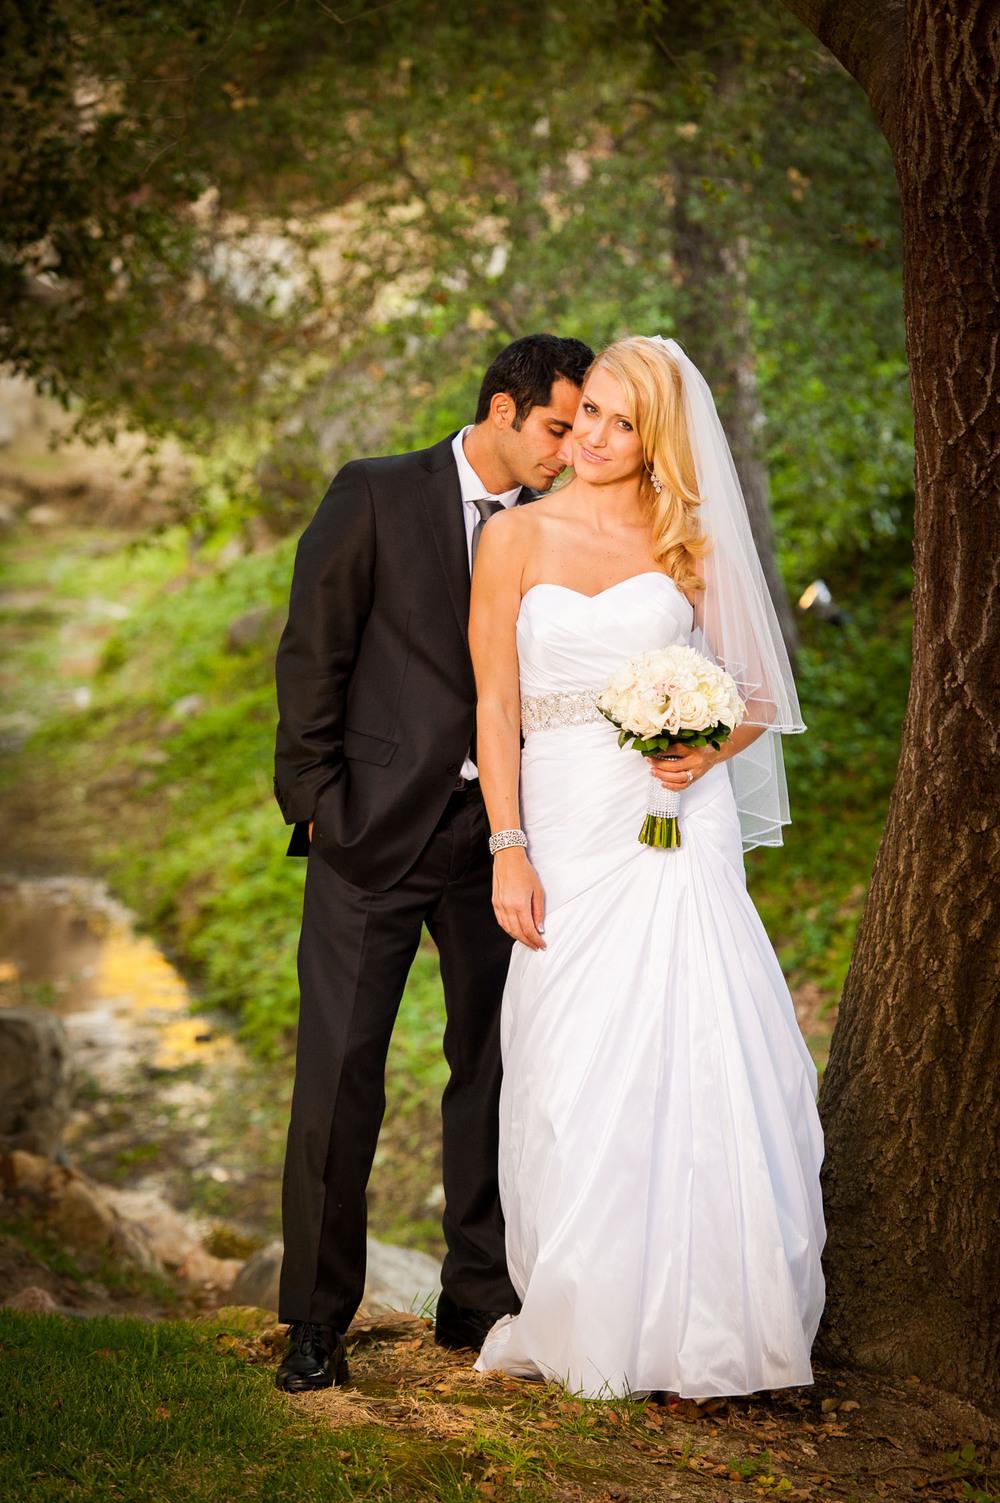 stewart_bertrand_wedding_photography_fclblogwed-1006.jpg